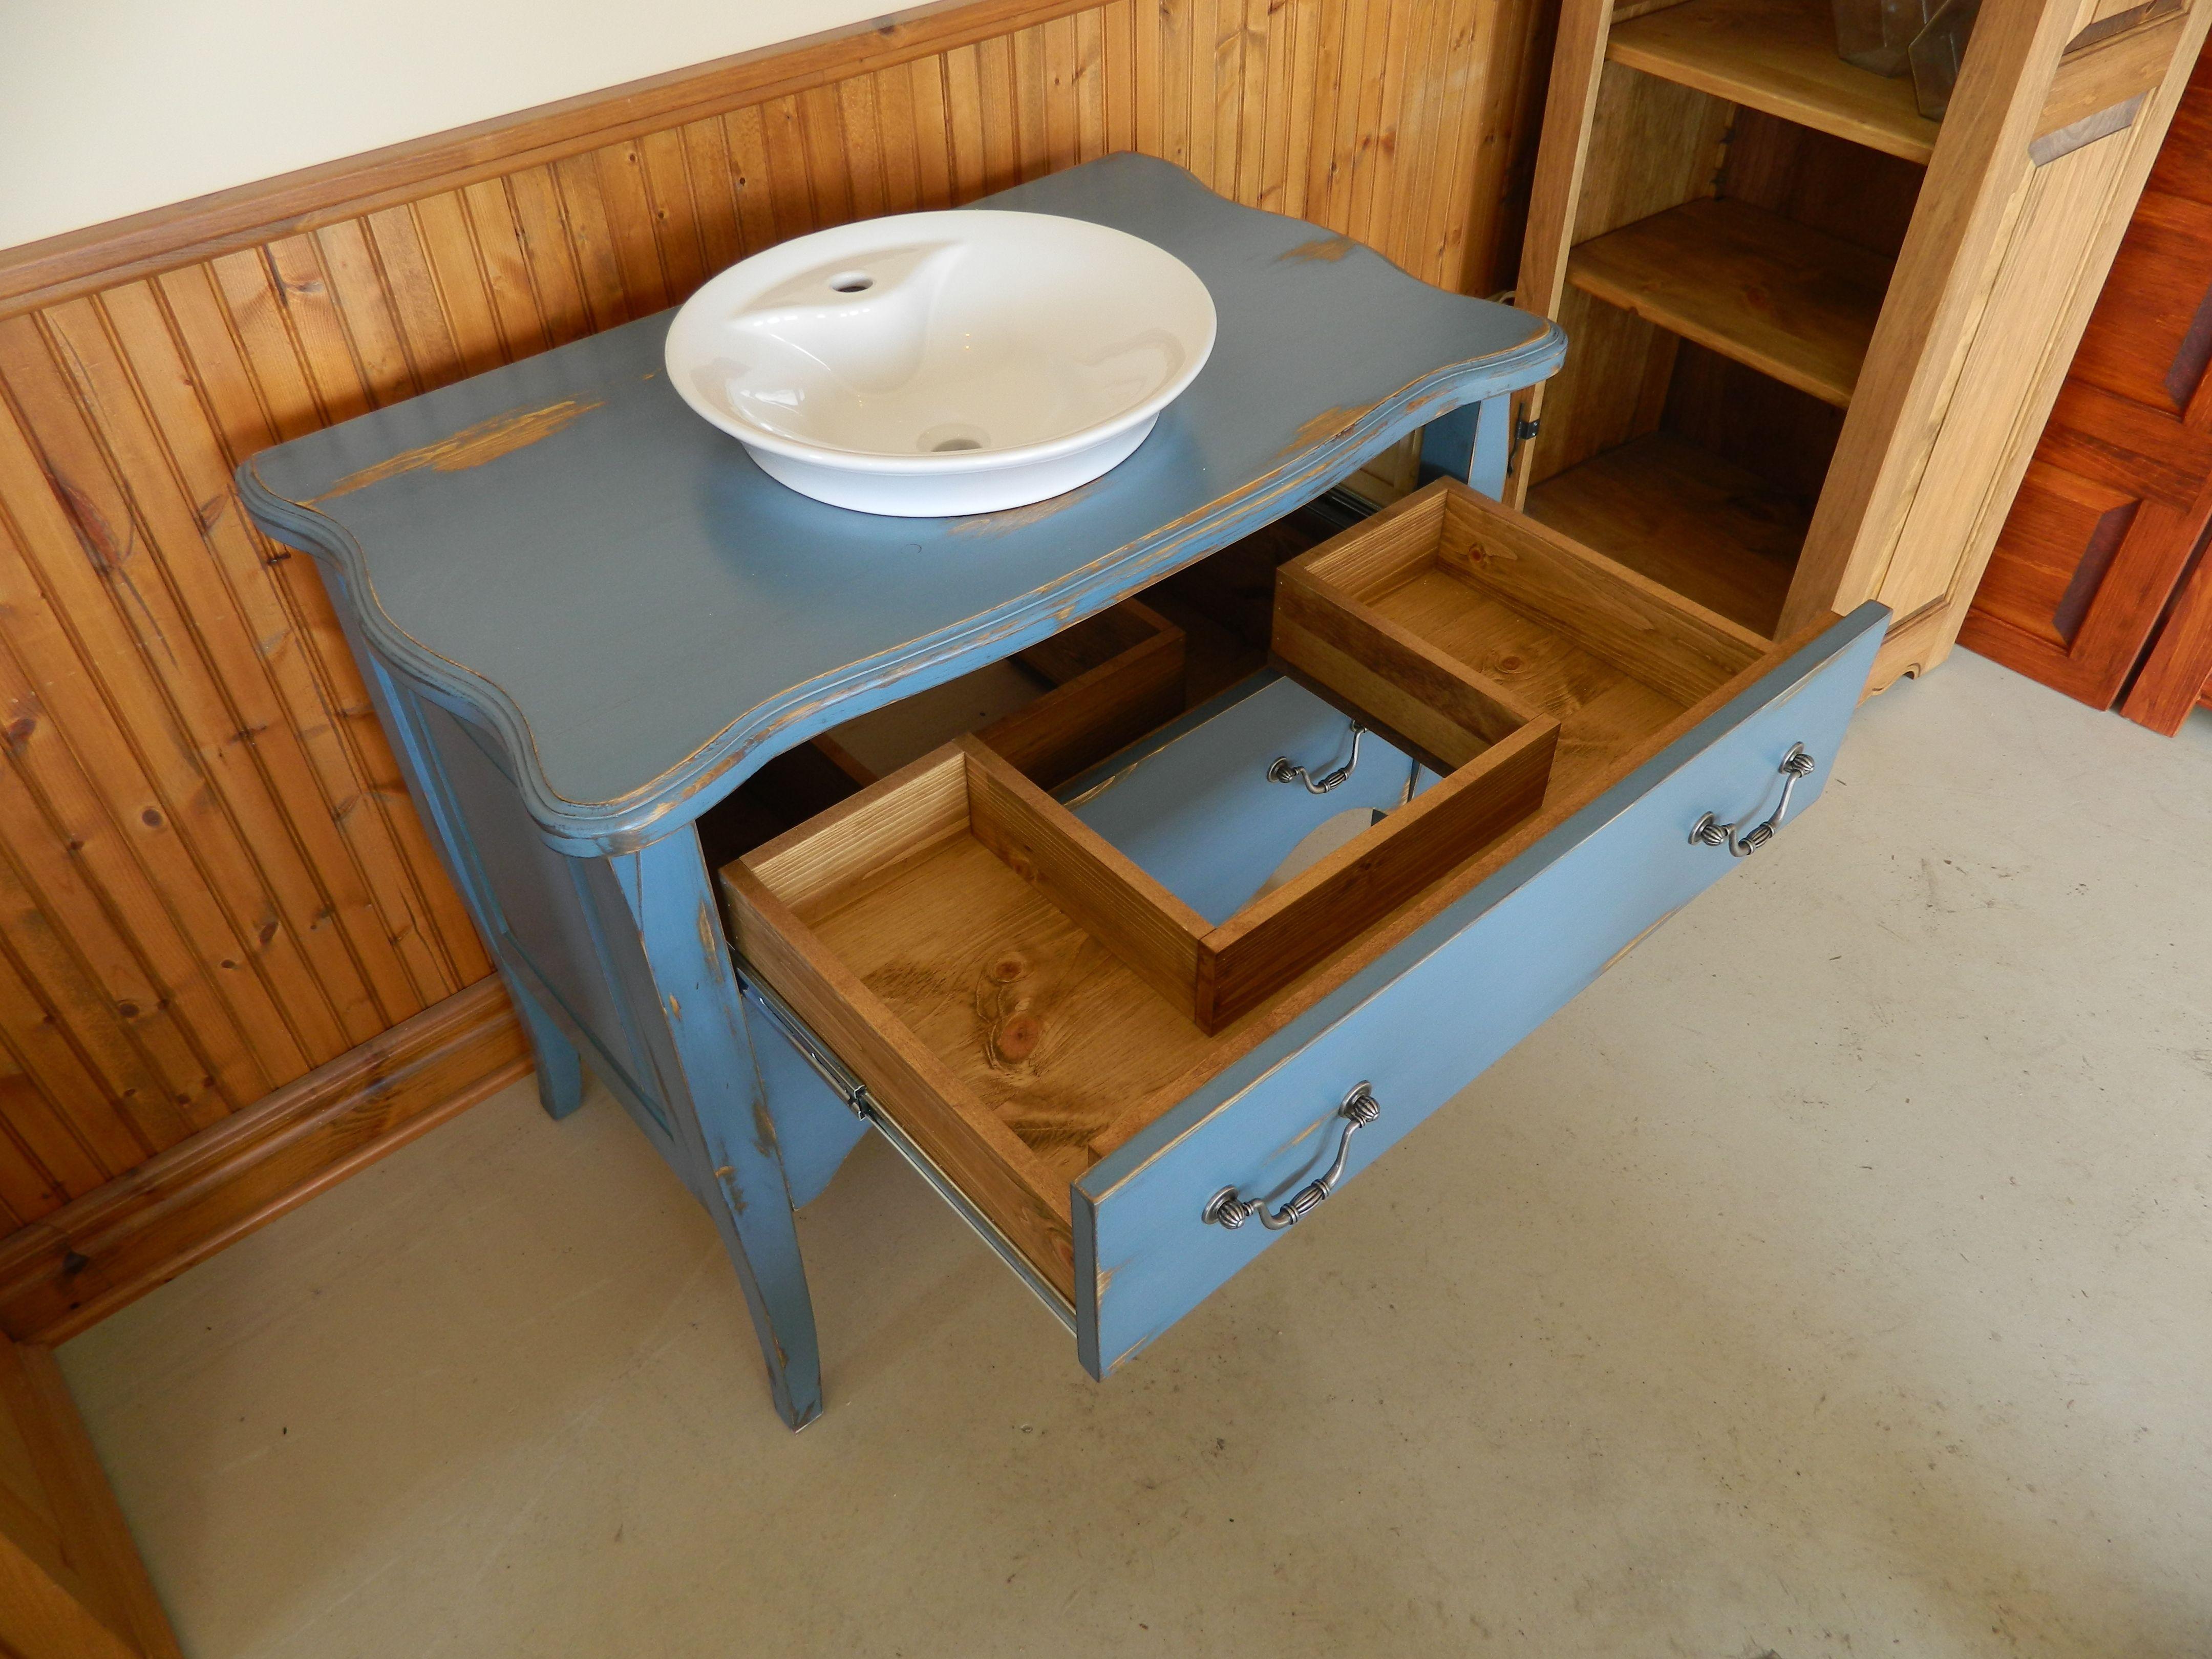 vanit salle de bain en pin bleue maritime homestead house style us tiroir en u - Salle De Bain Vanite Montreal